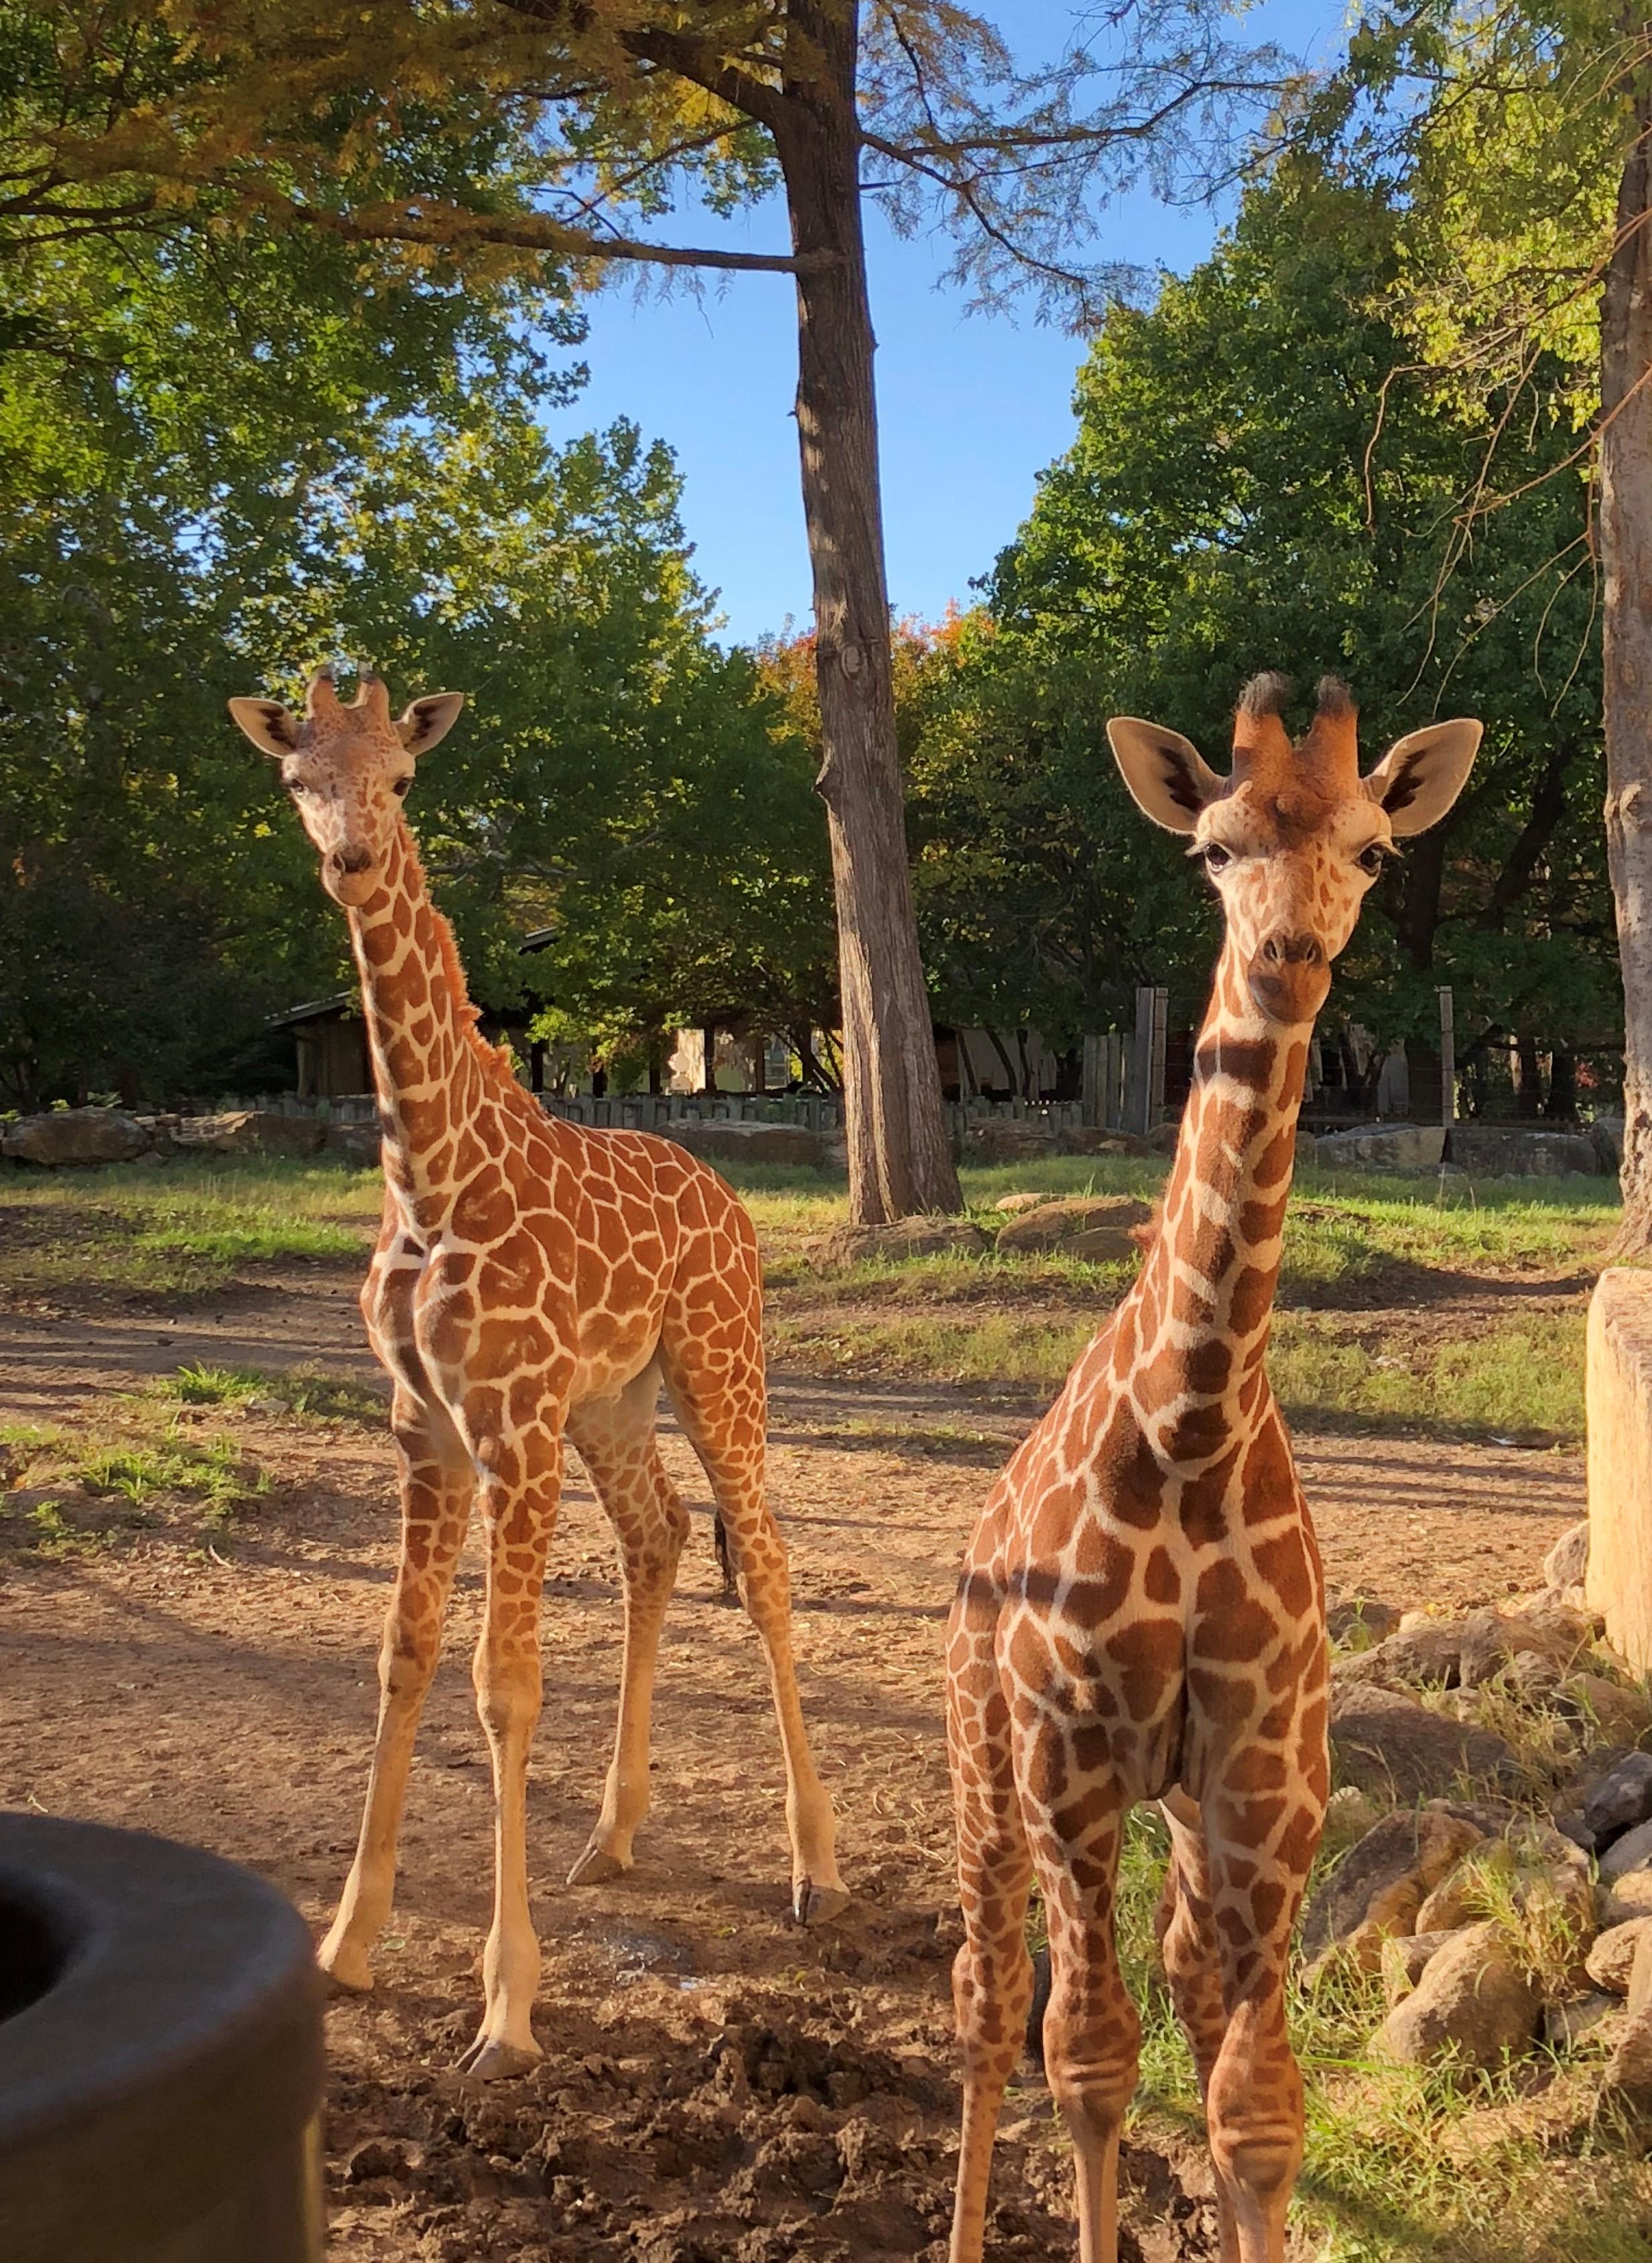 two baby giraffes at Topeka Zoo